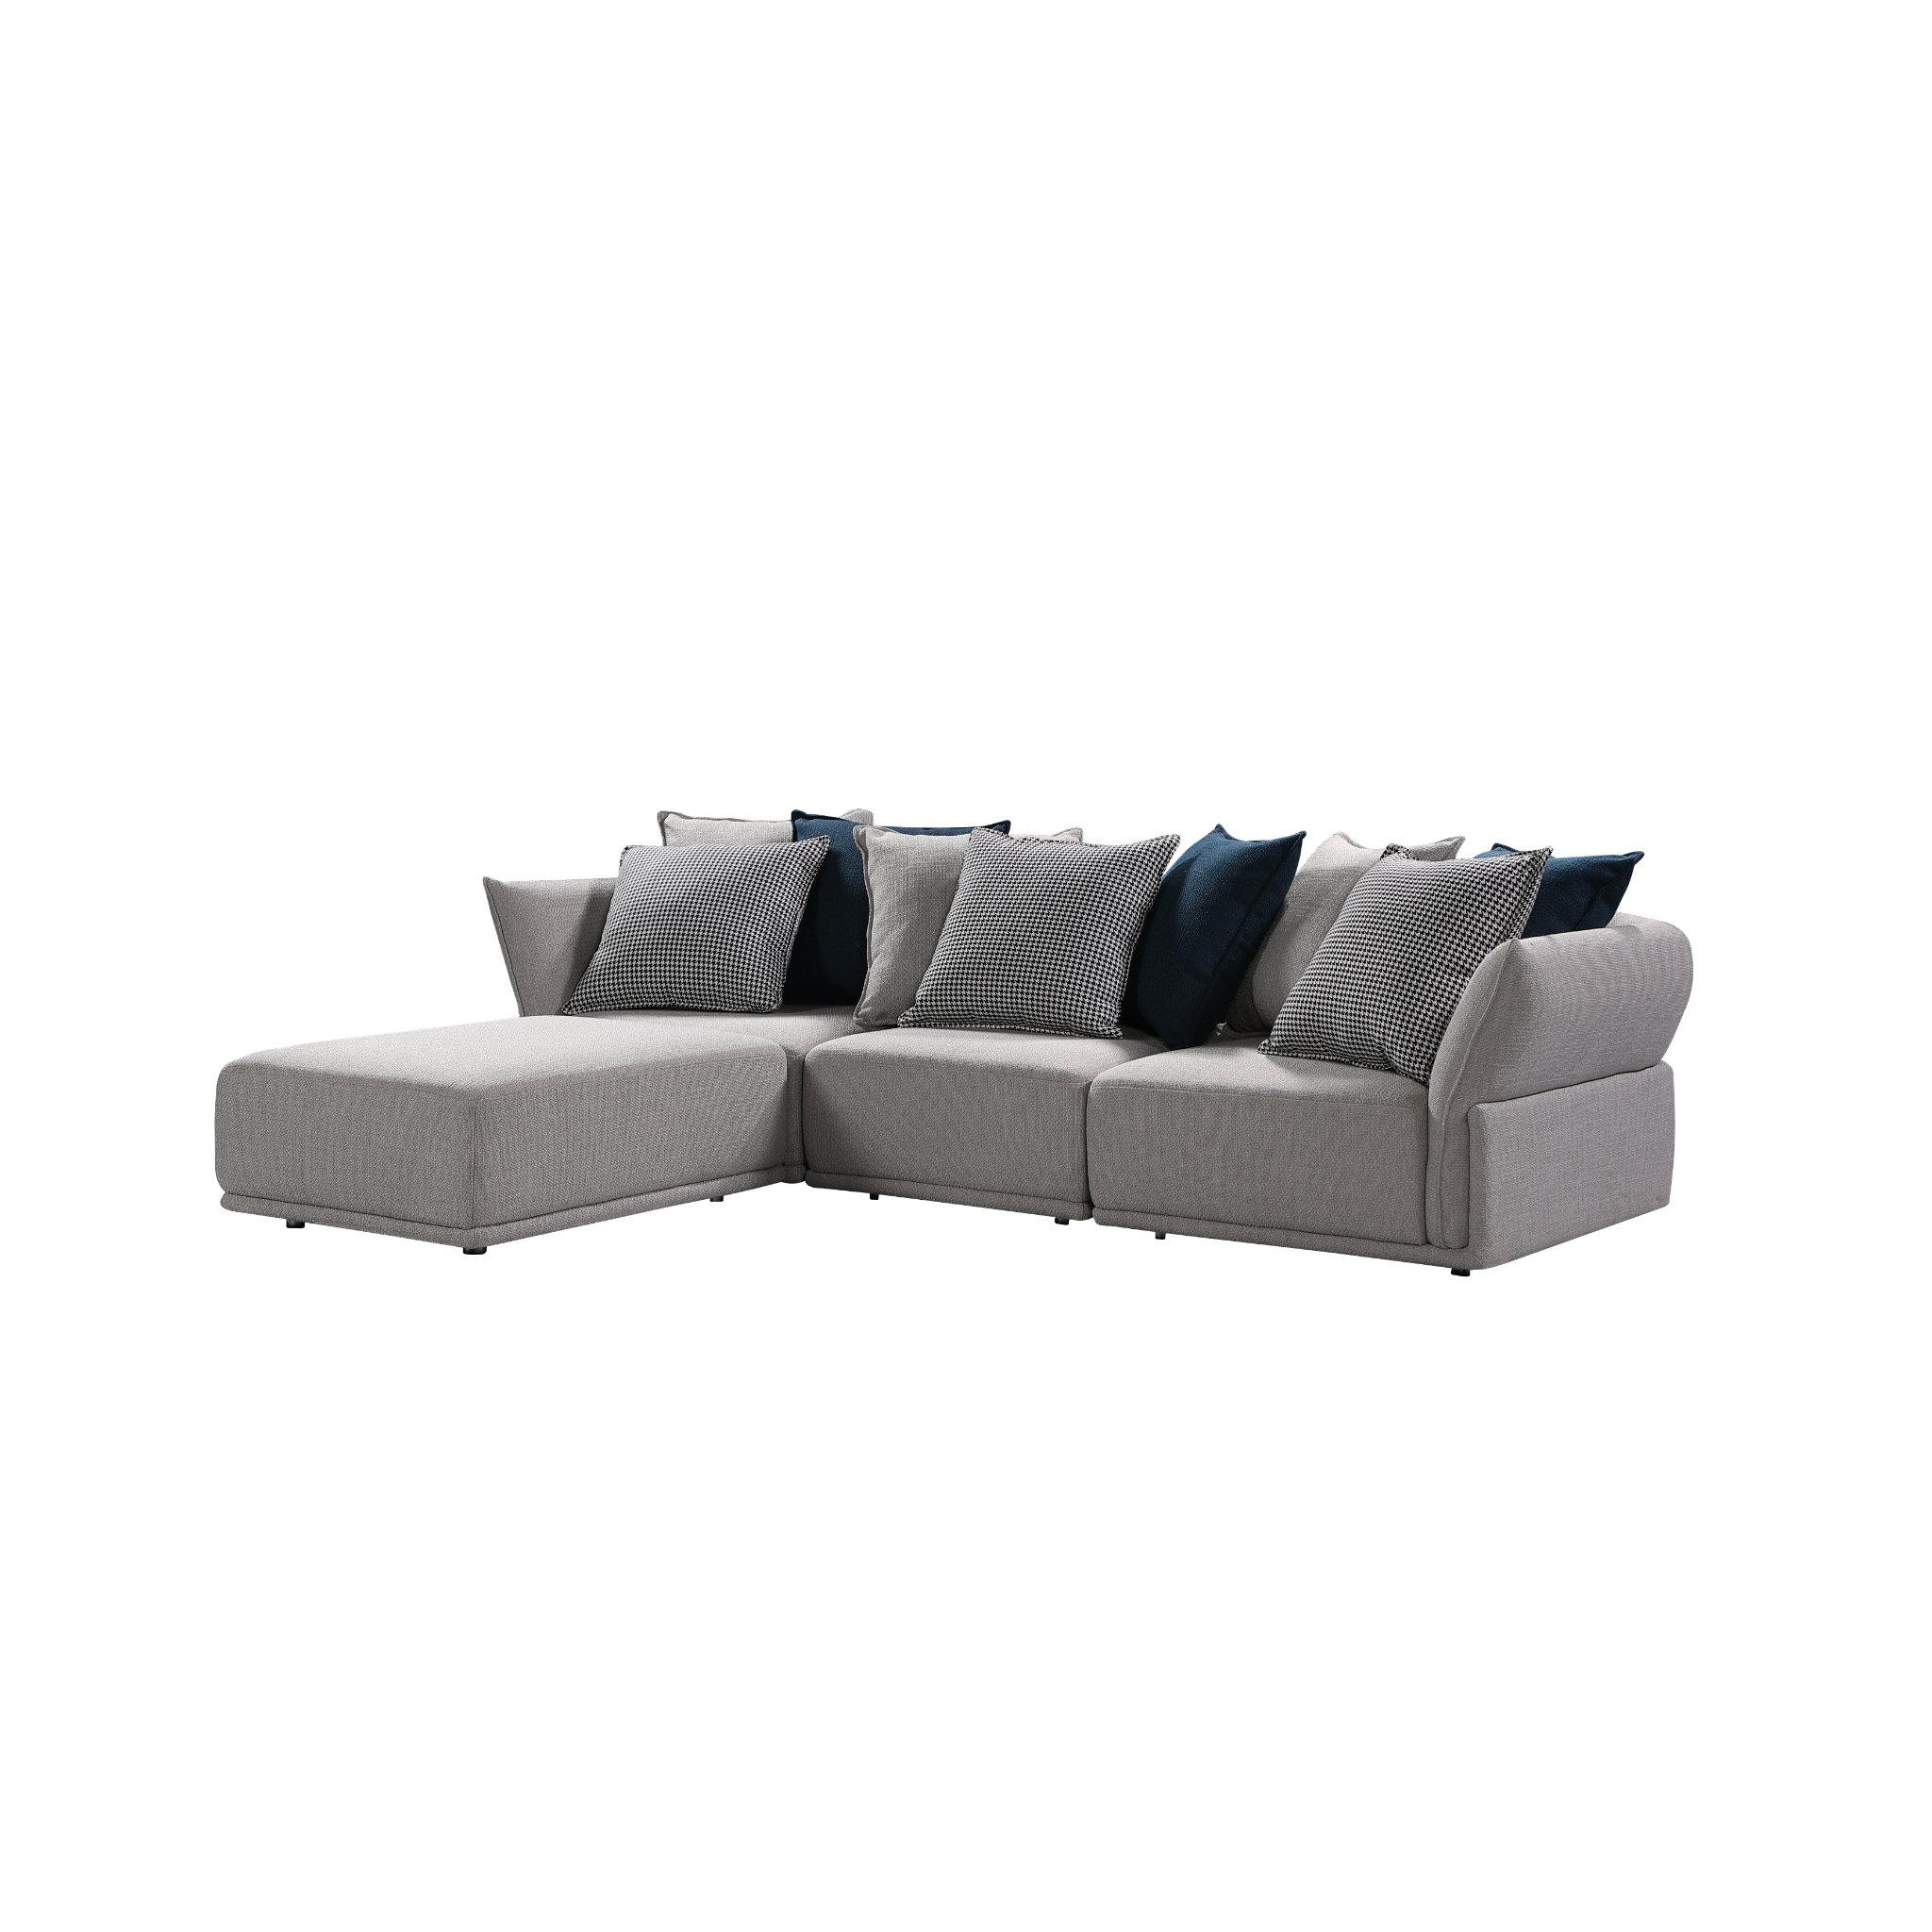 Stratus Sofa Modern Modular Sectional Set Of 4 Expand Furniture Folding Tables Smarter Wall Beds Space Savers